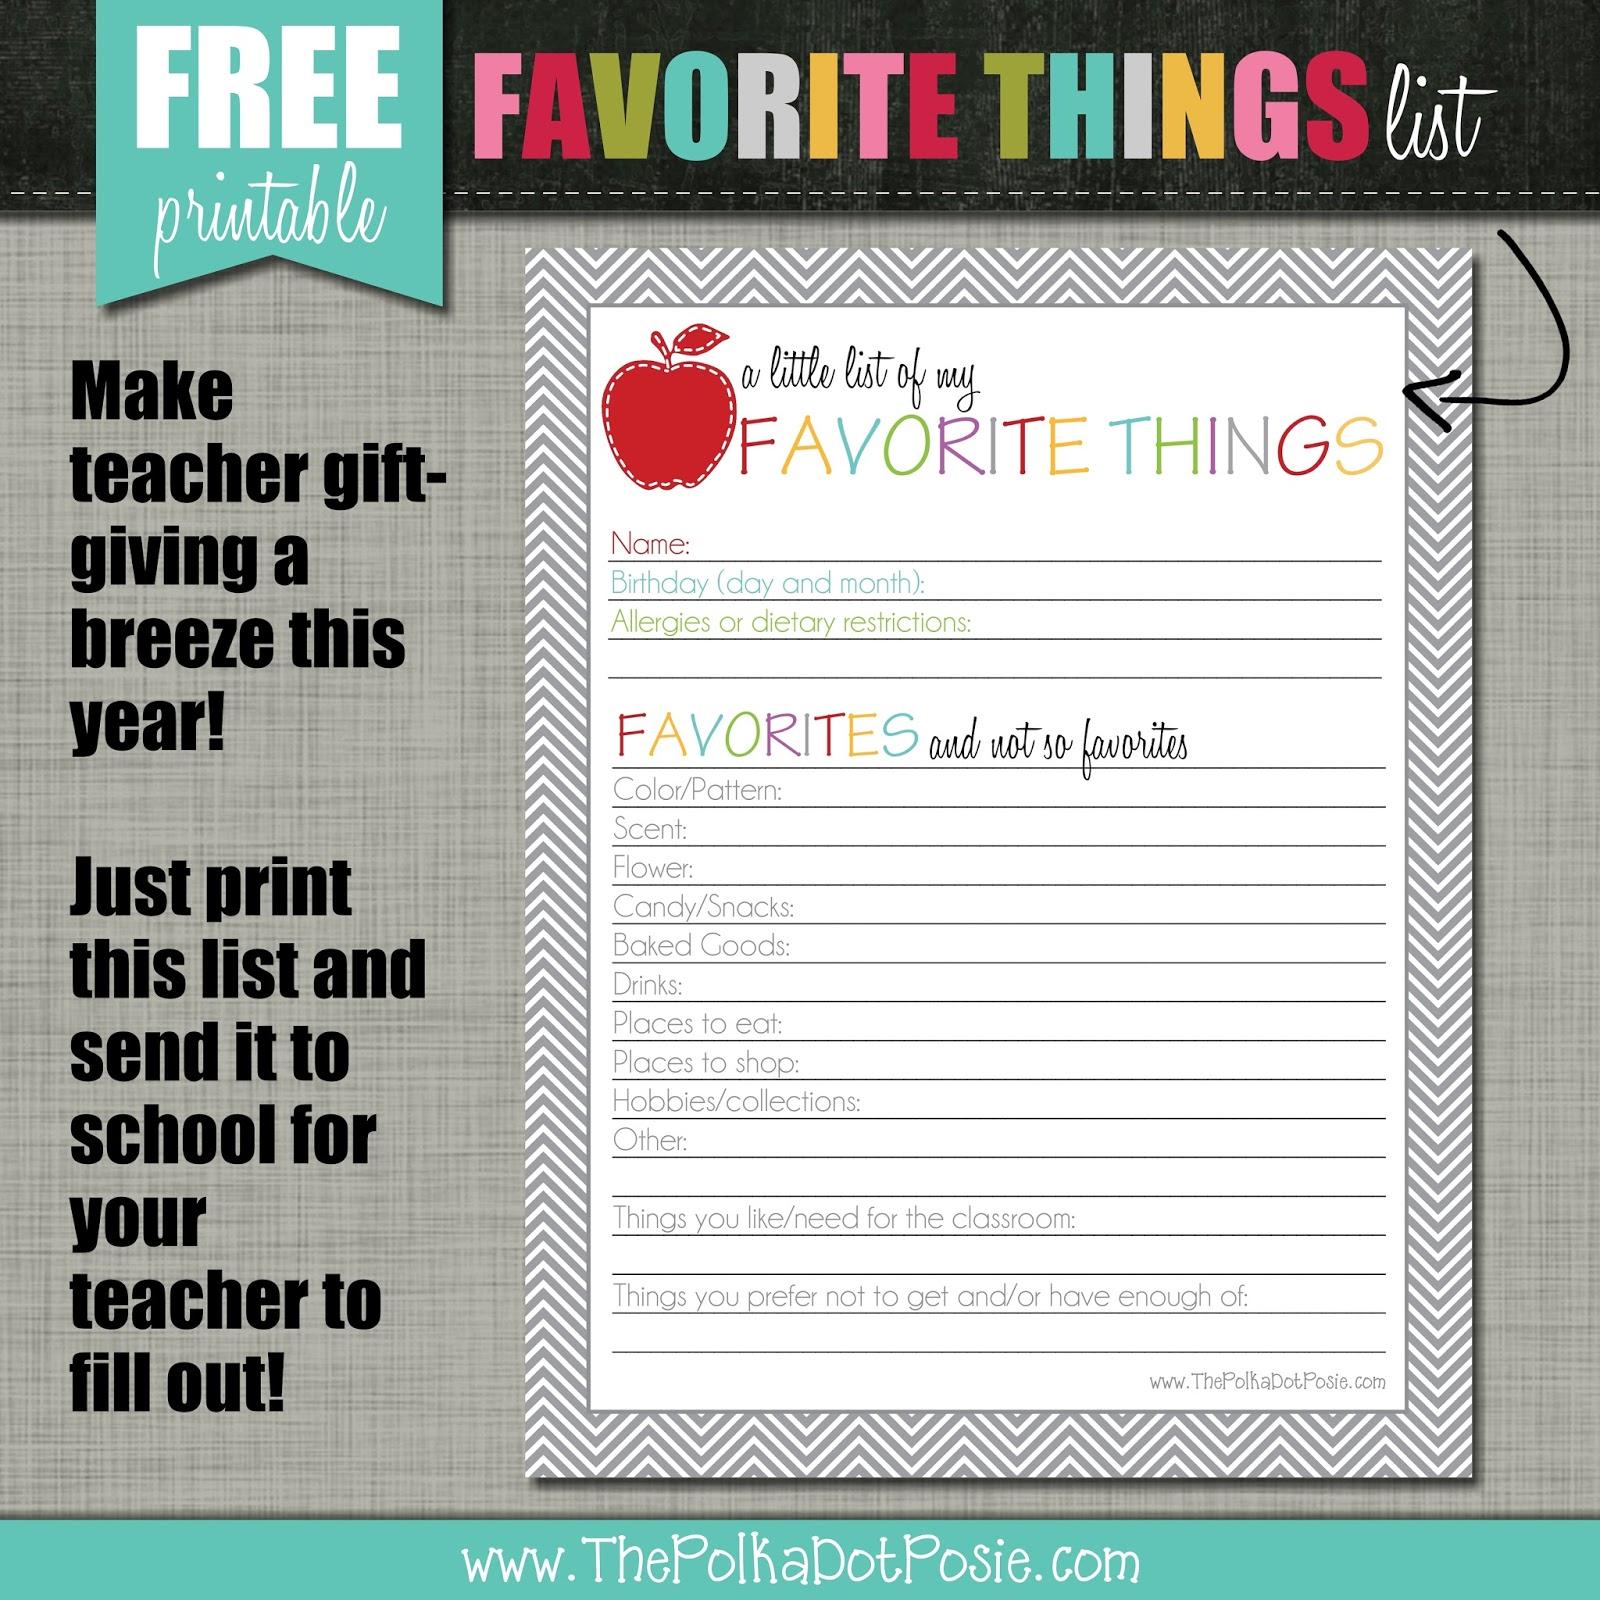 photo regarding Teacher Favorite Things Printable titled The Polka Dot Posie